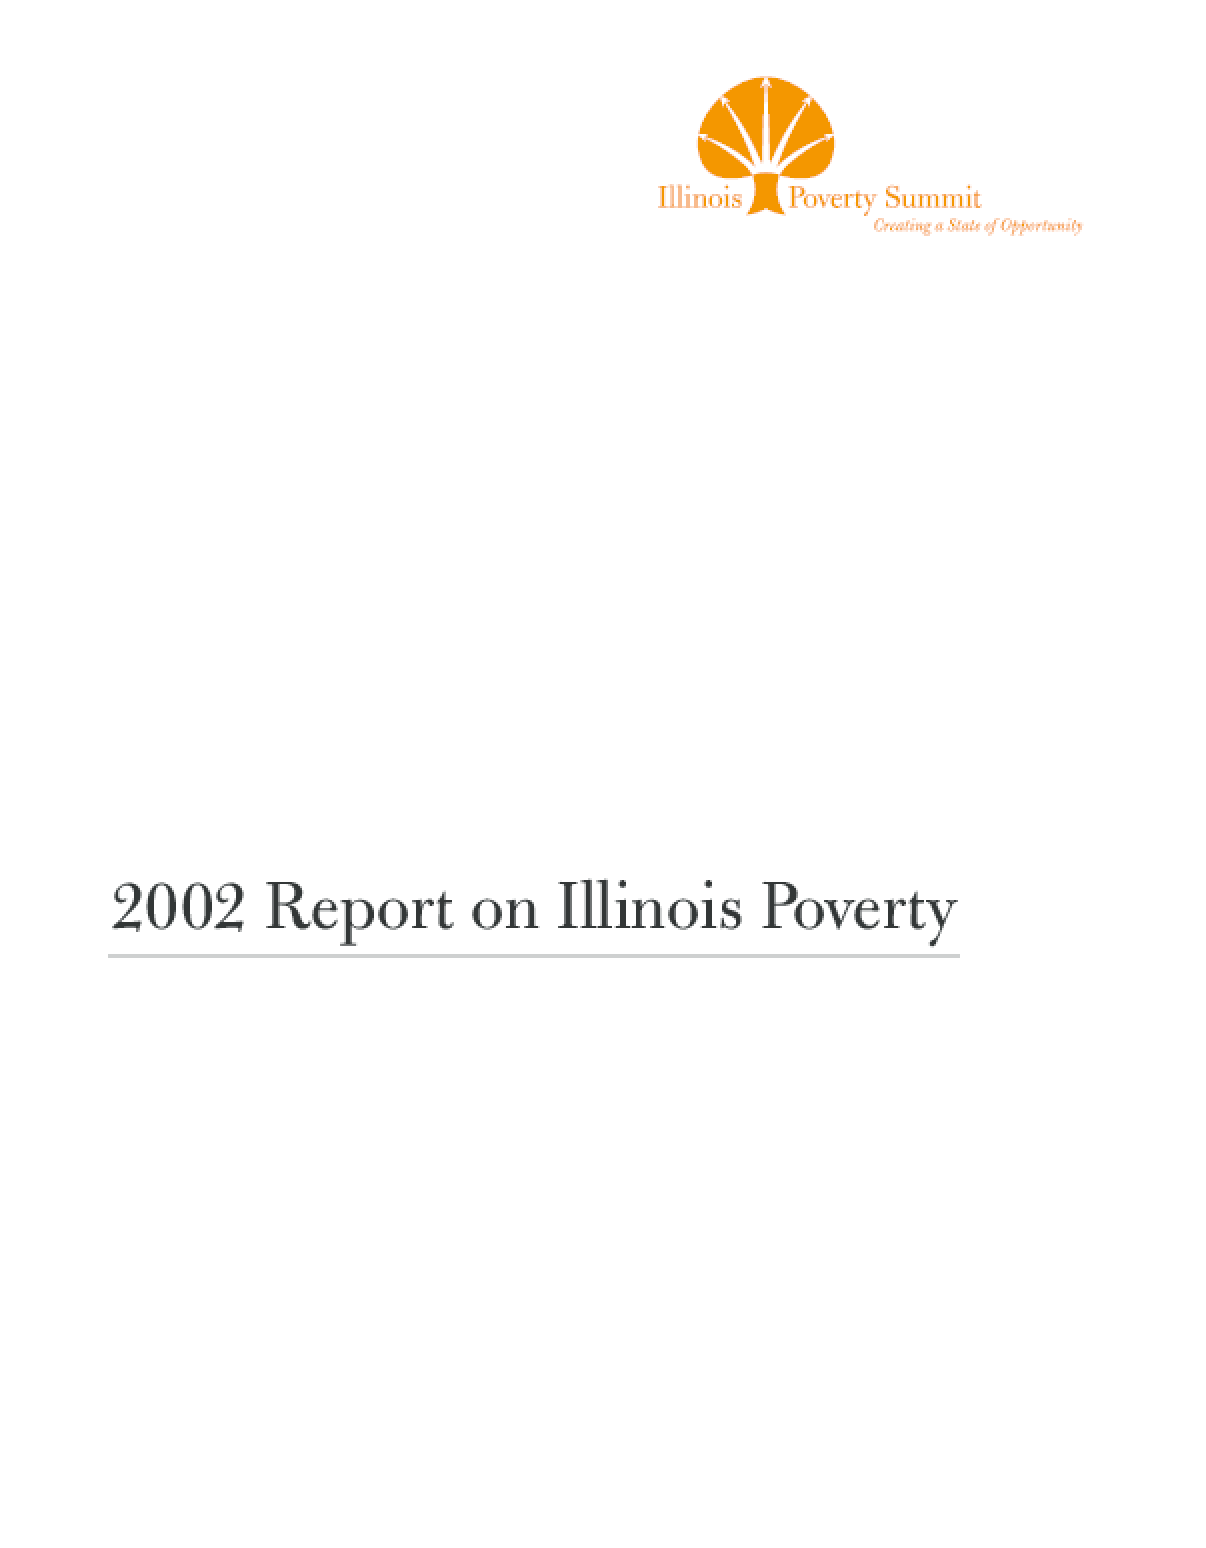 2002 Report on Illinois Poverty